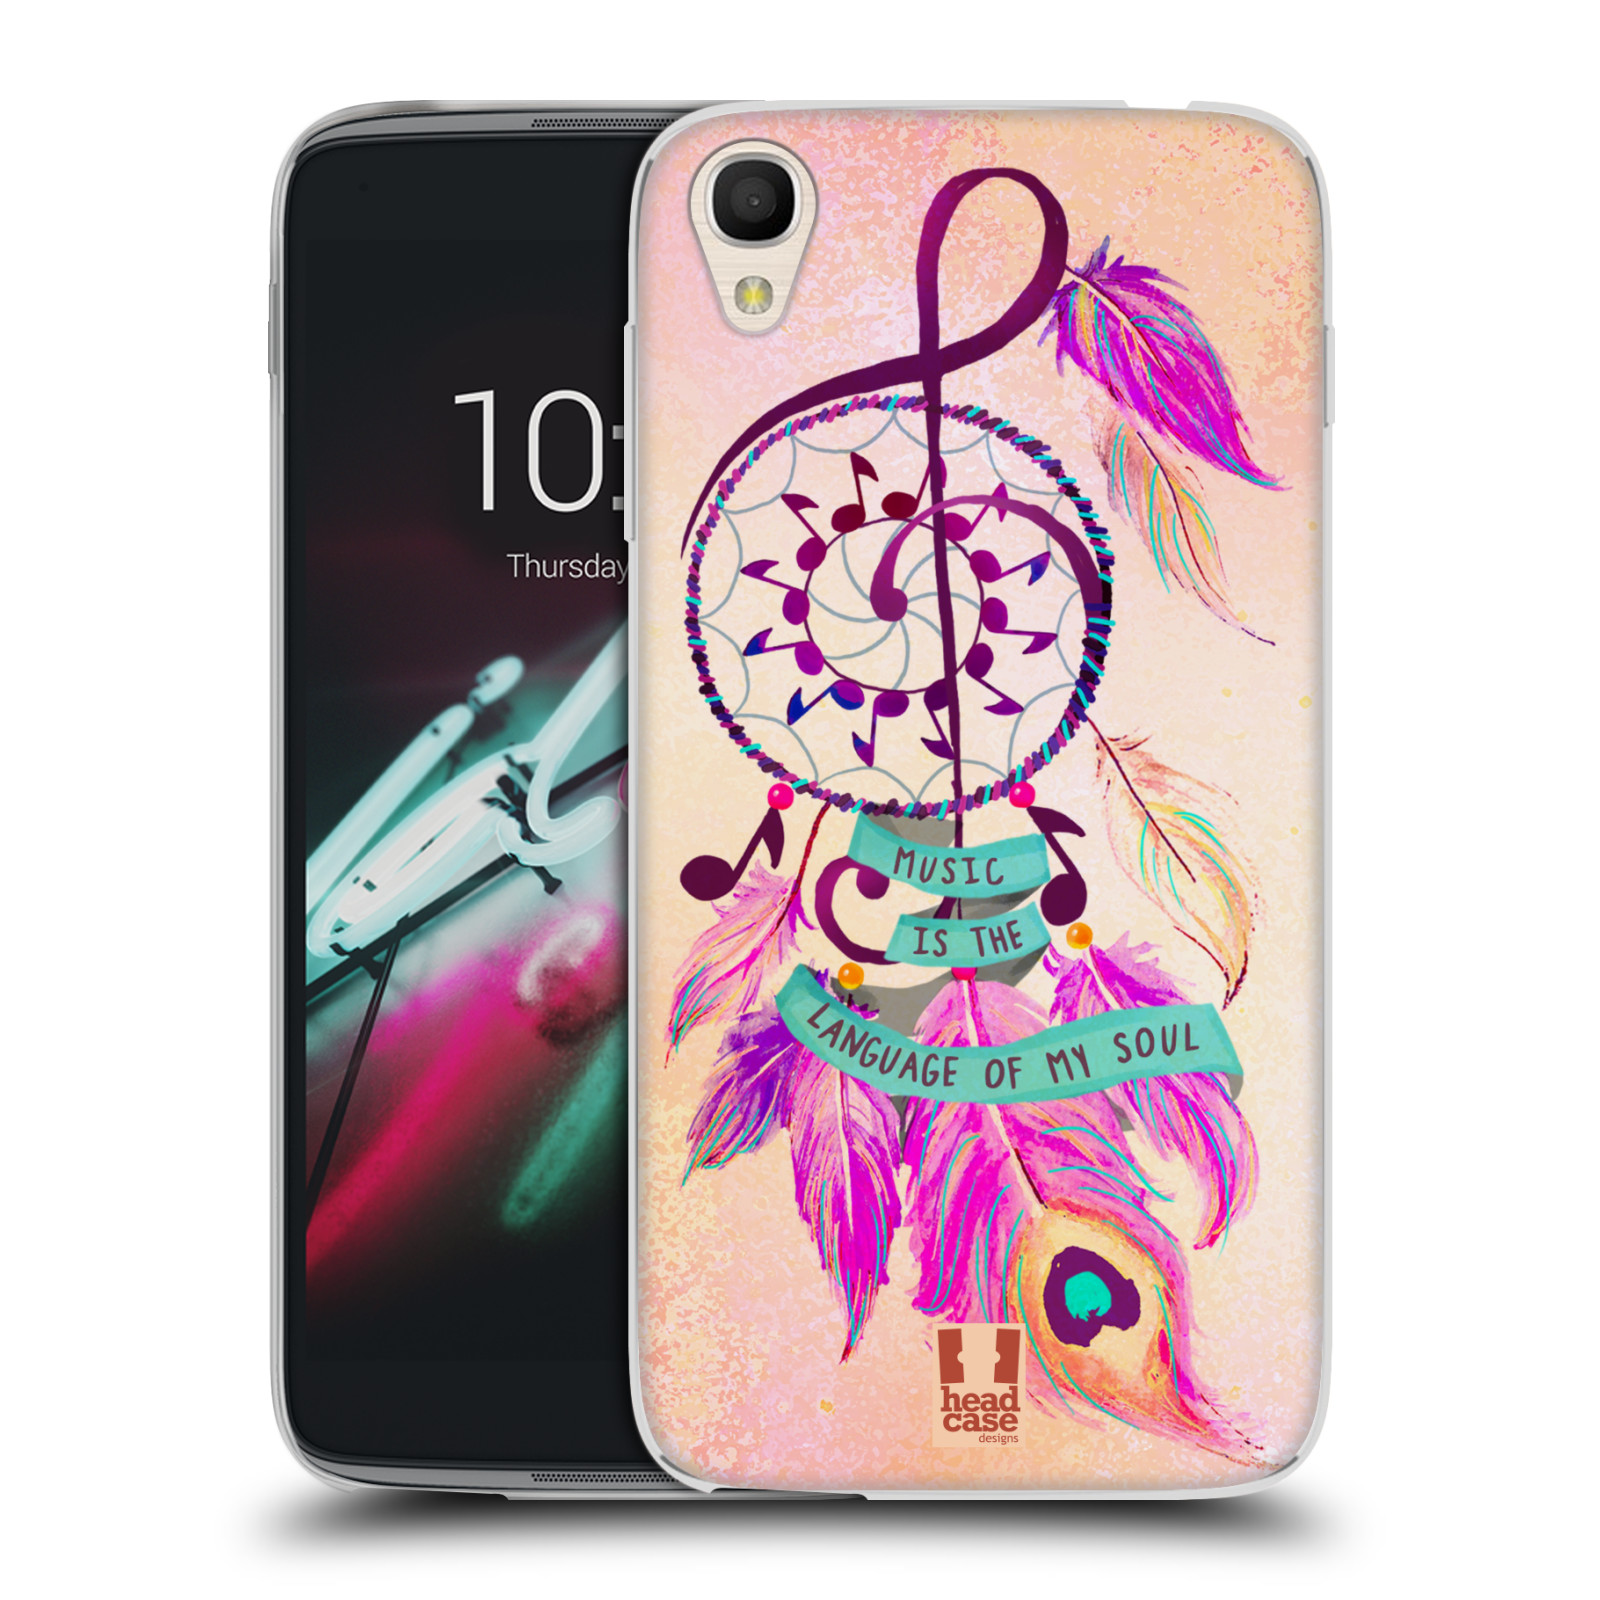 "Silikonové pouzdro na mobil Alcatel One Touch 6039Y Idol 3 HEAD CASE Lapač Assorted Music (Silikonový kryt či obal na mobilní telefon Alcatel One Touch Idol 3 OT-6039Y s 4,7"" displejem)"